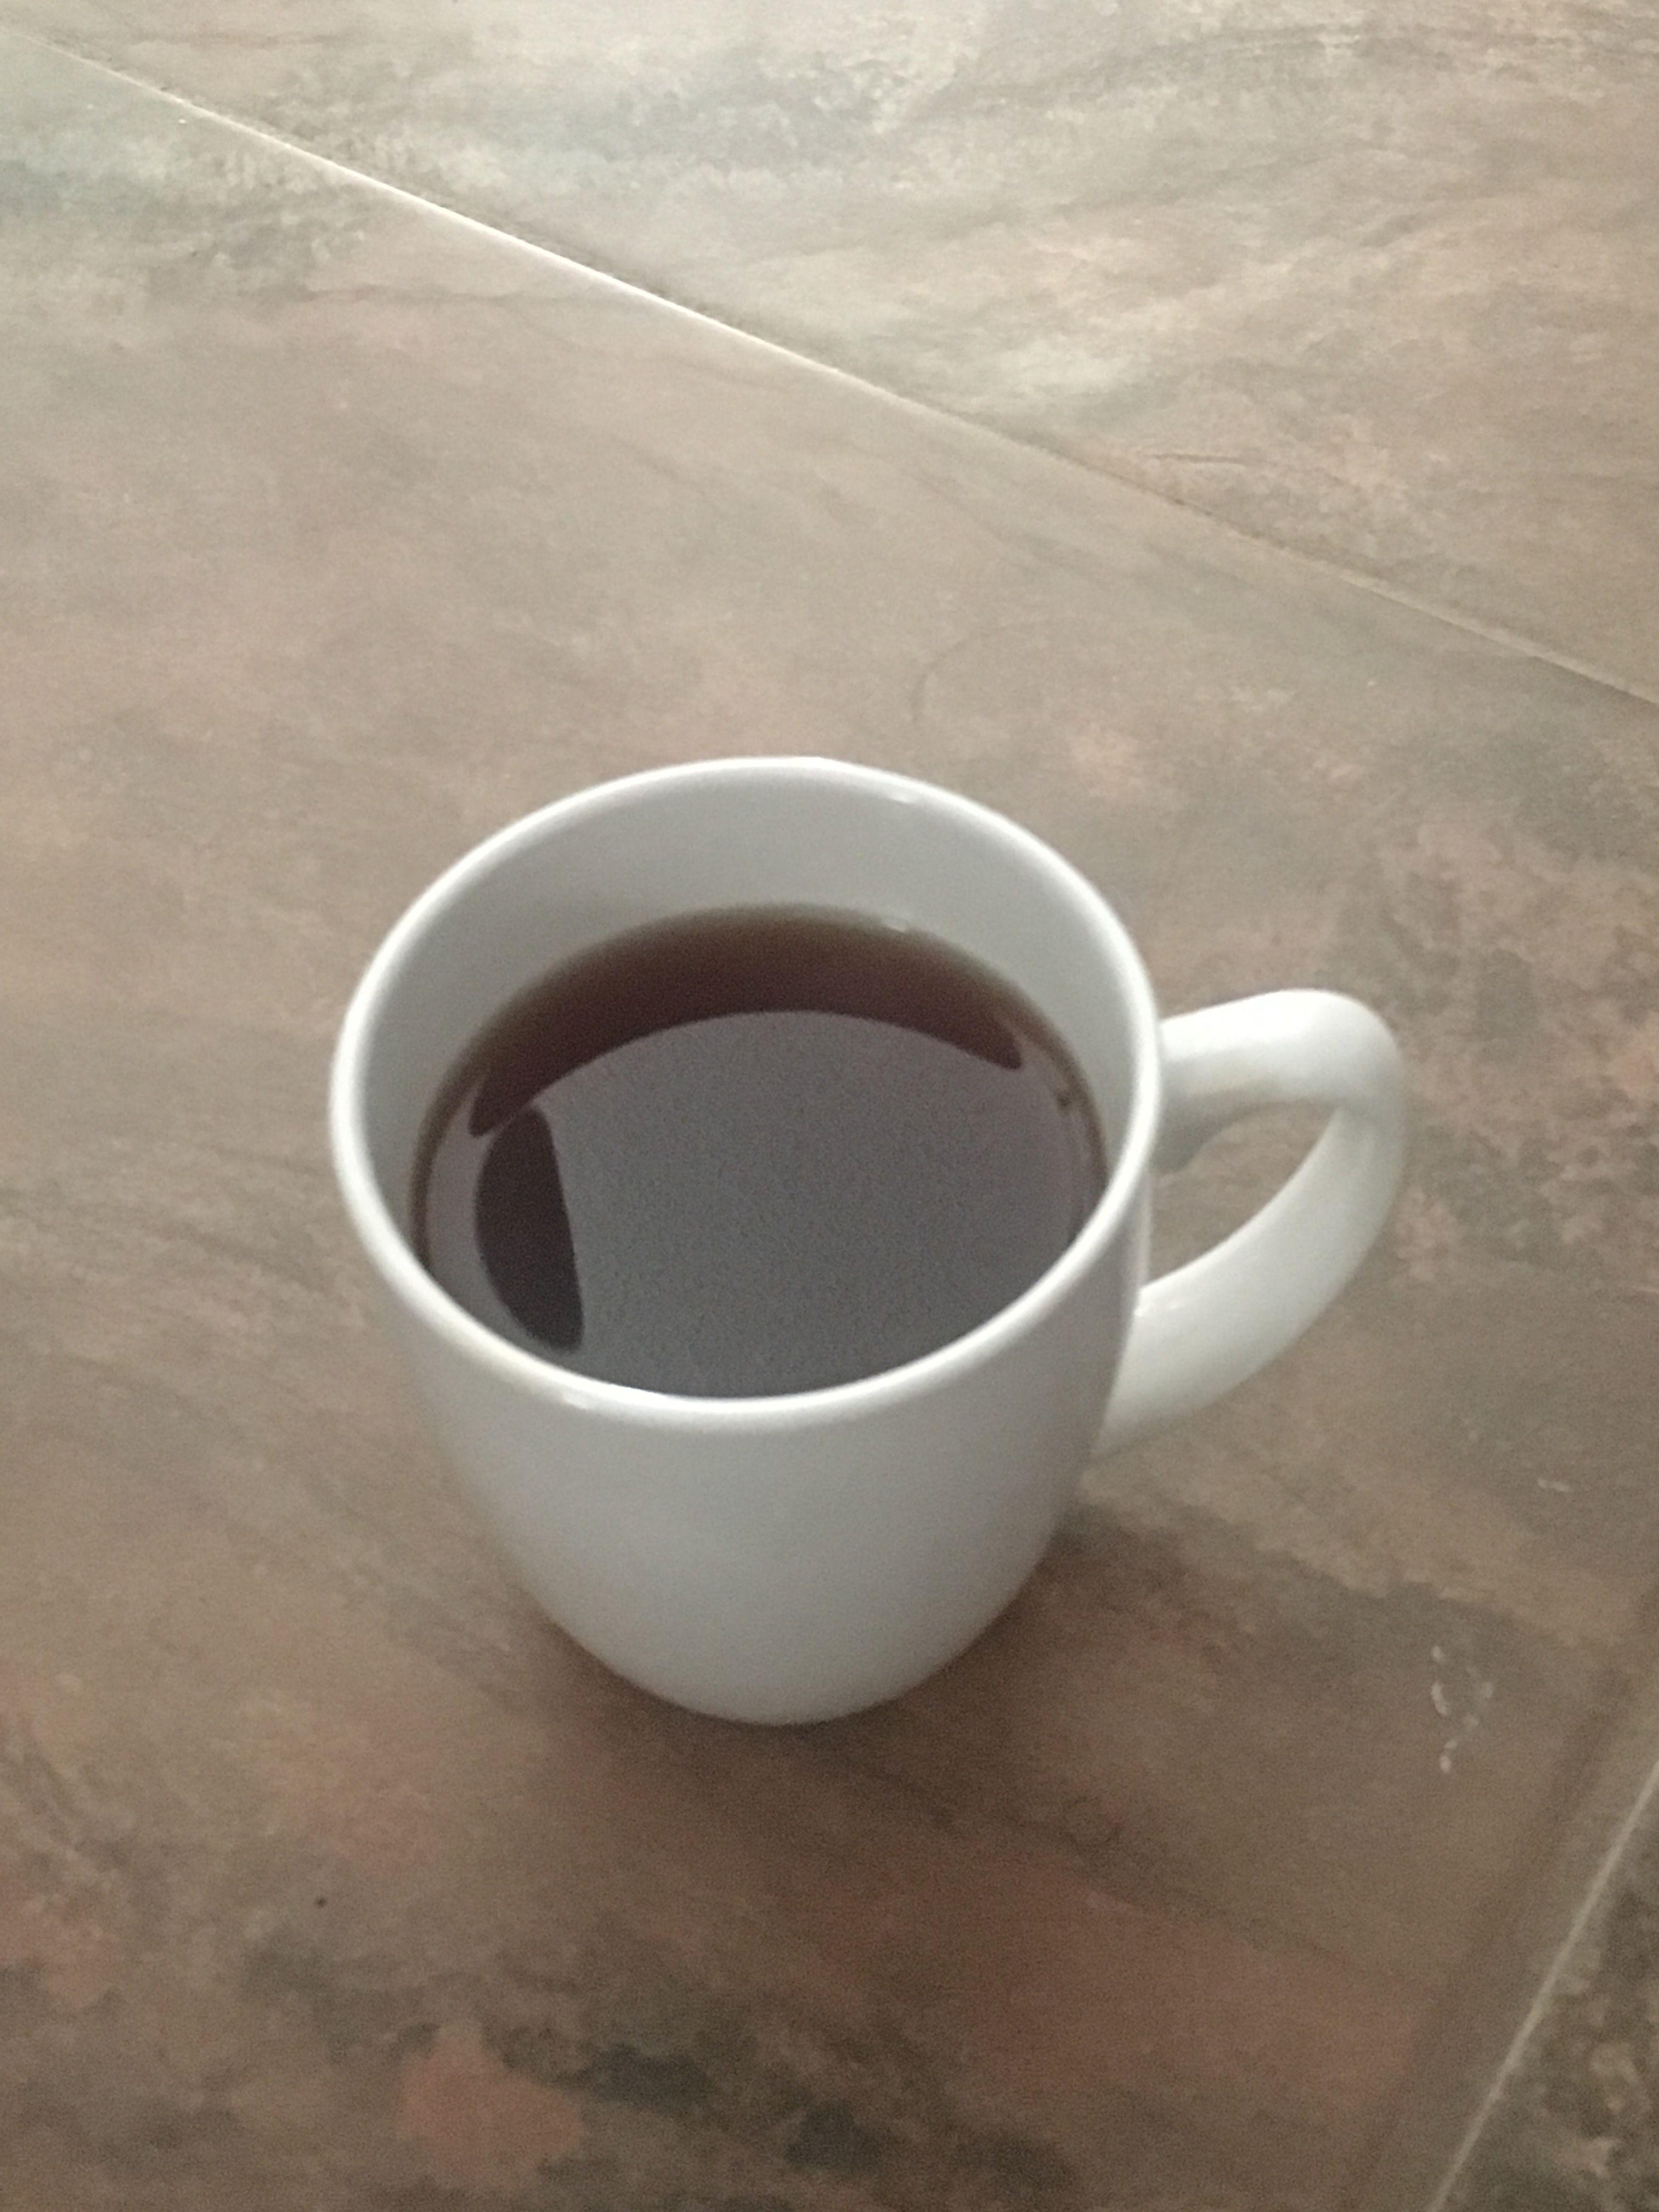 Morning chai tea